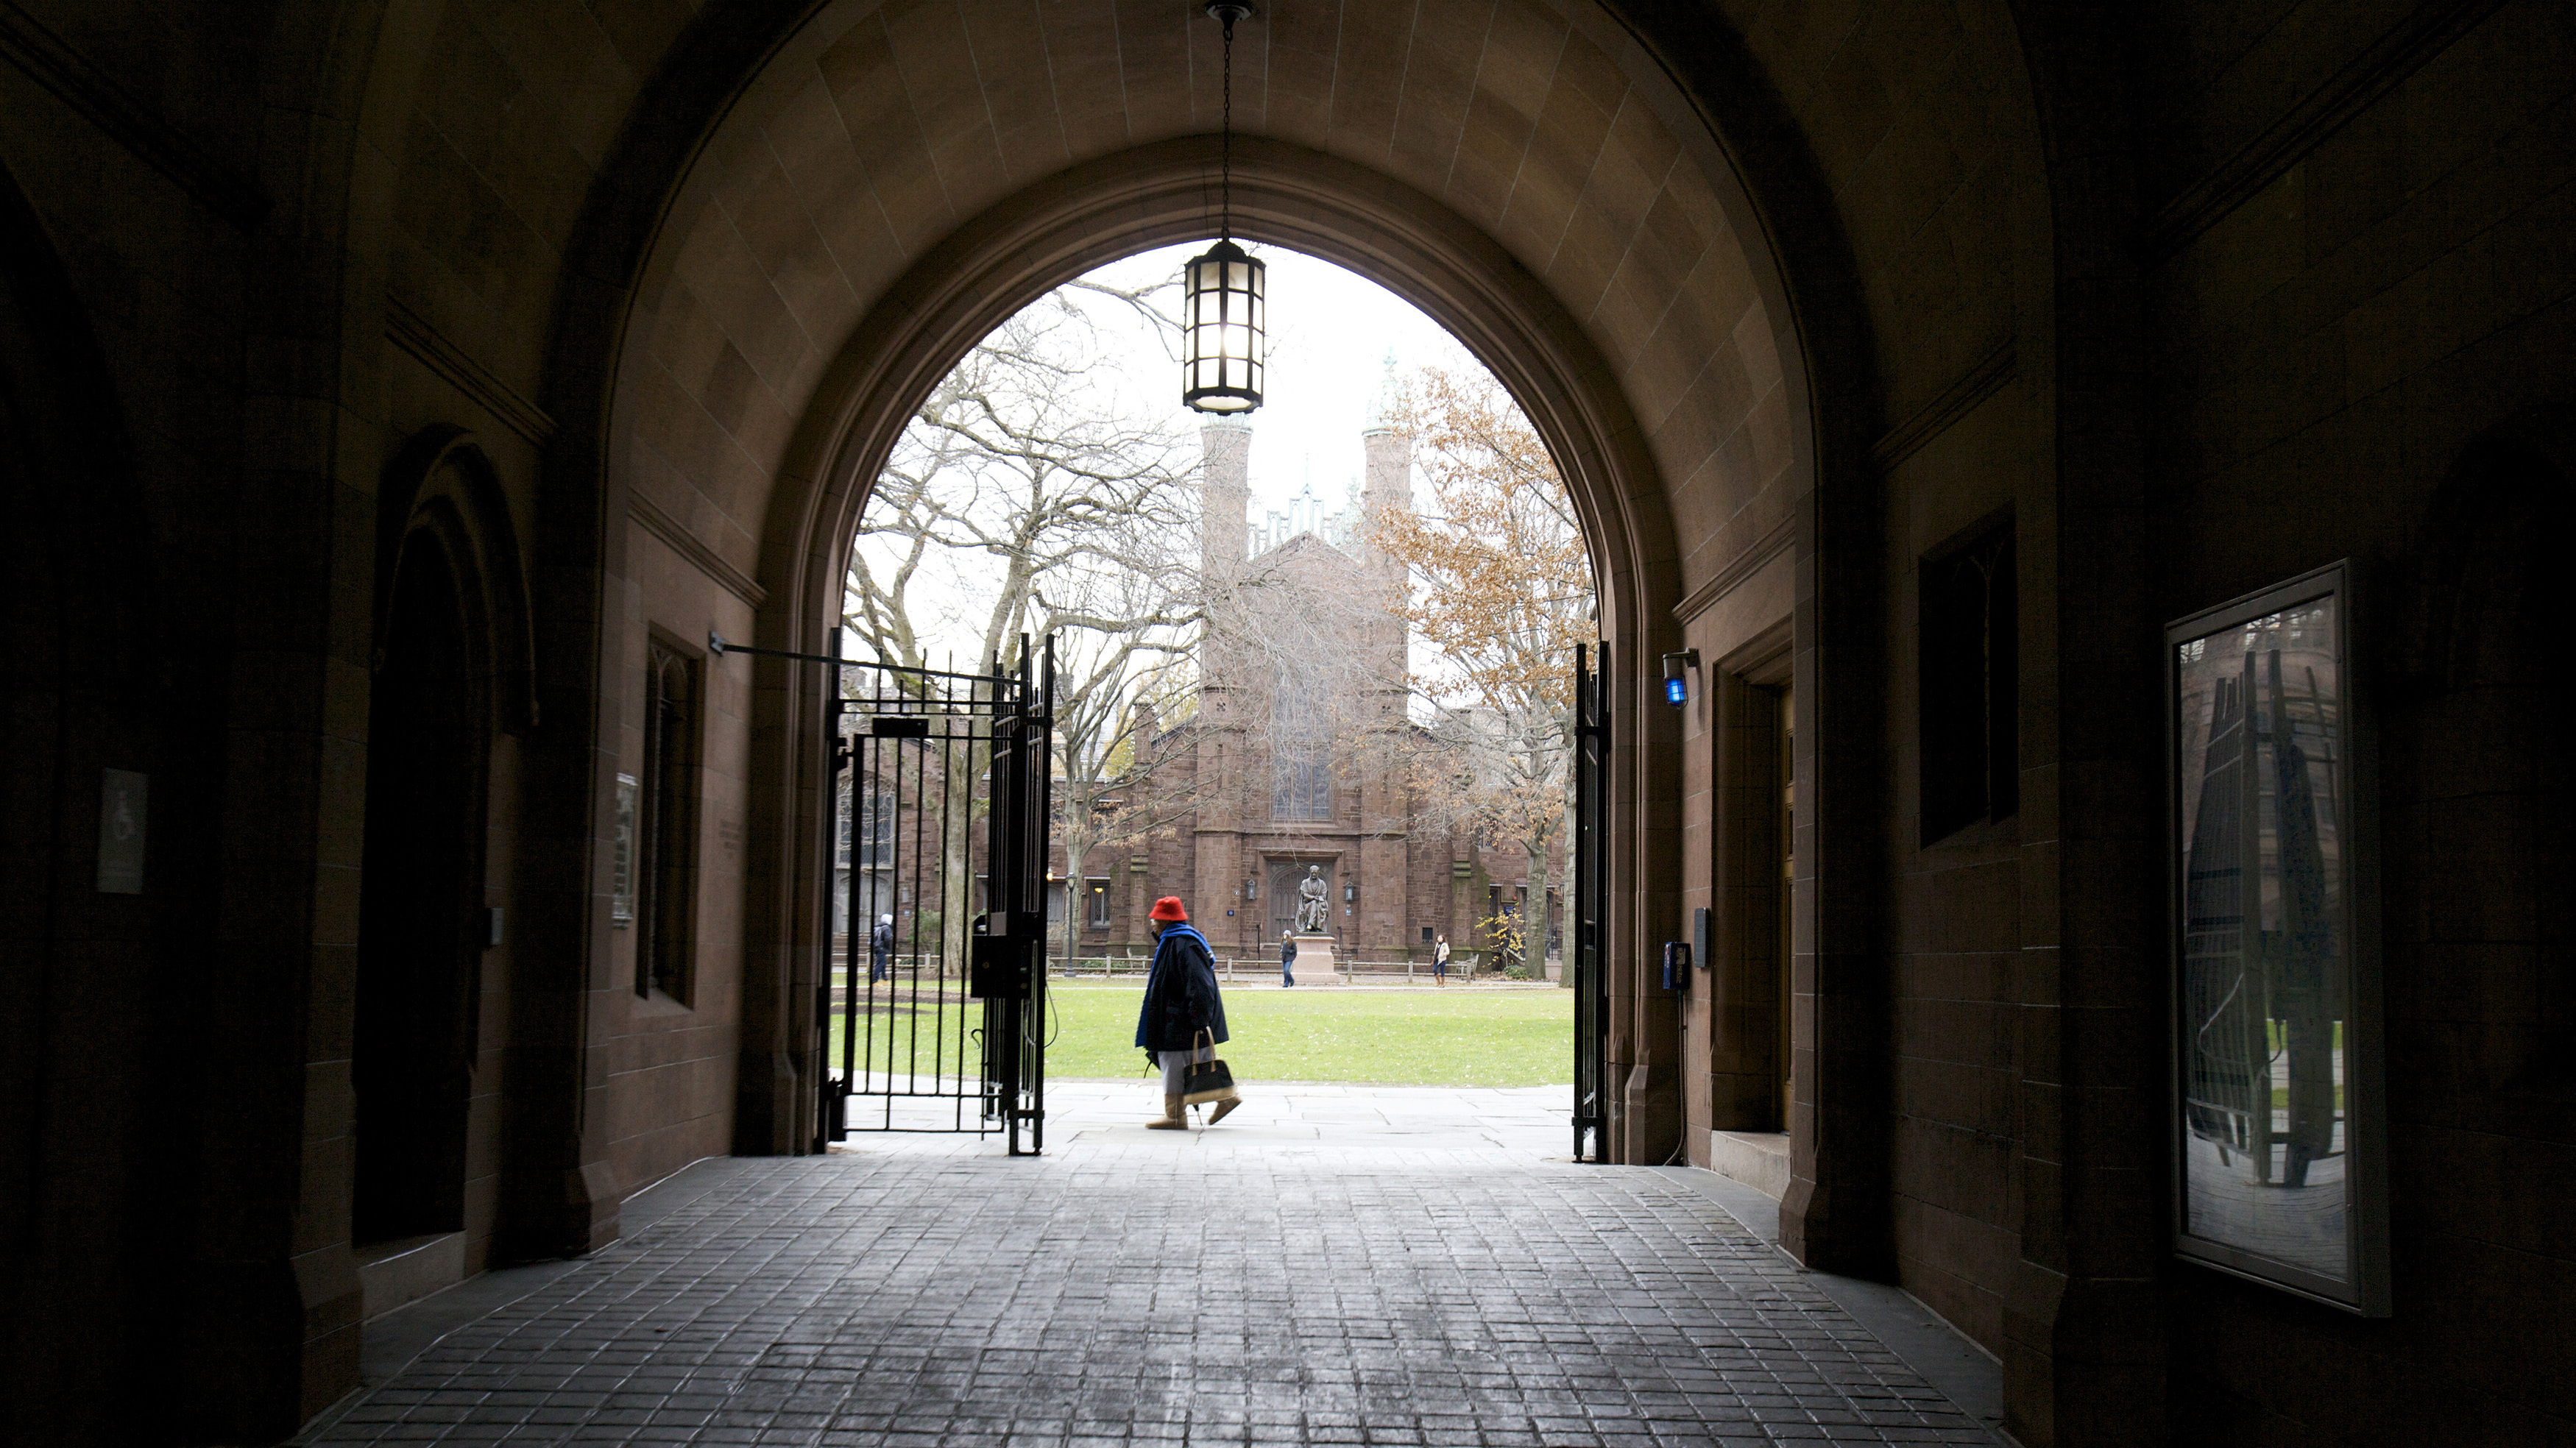 In Elite Schools' Vast Endowments, Malcolm Gladwell Sees 'Obscene' Inequity